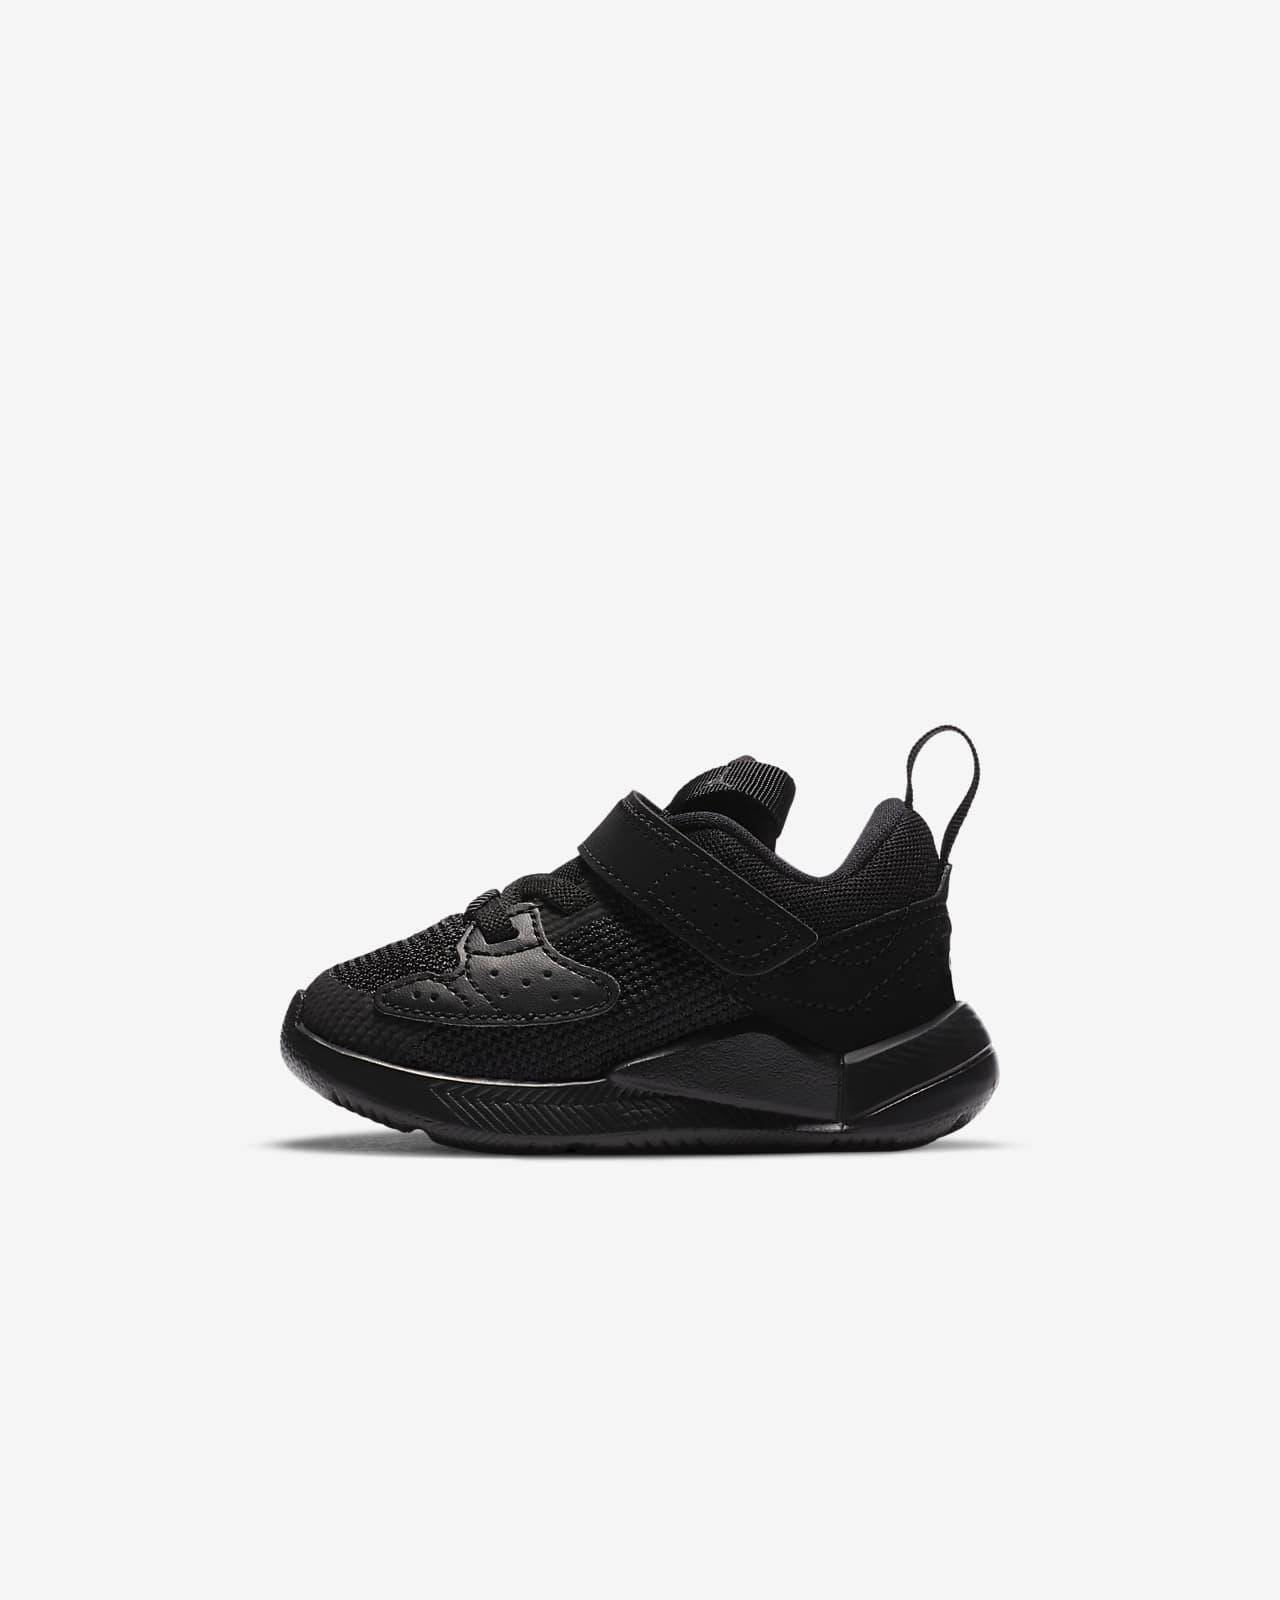 Jordan Cadence Baby/Toddler Shoe